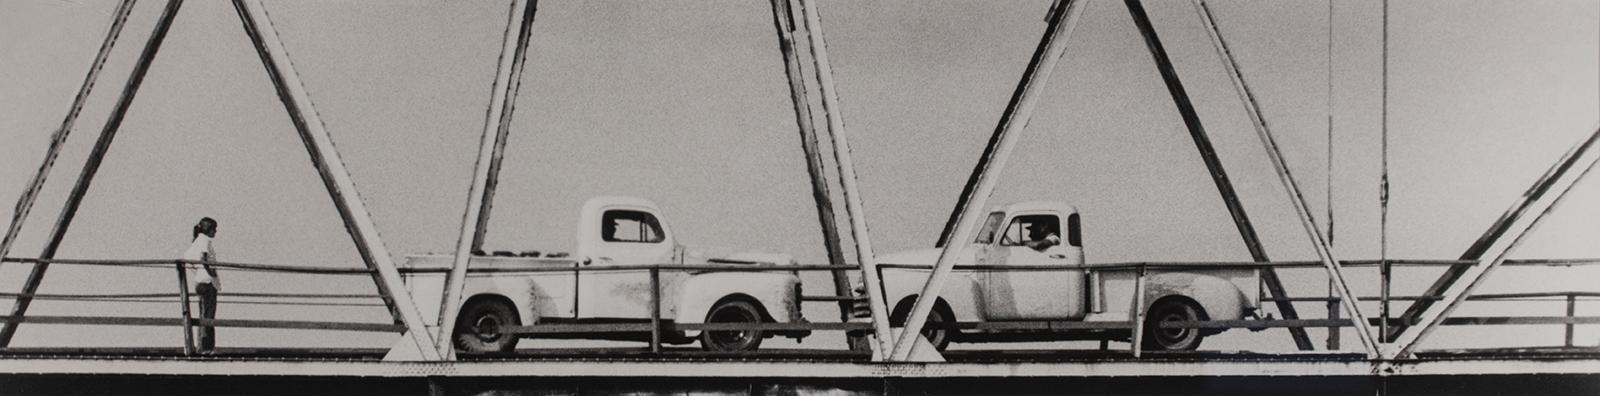 John Baldessari, Two Trucks (with Onlooker), 2008